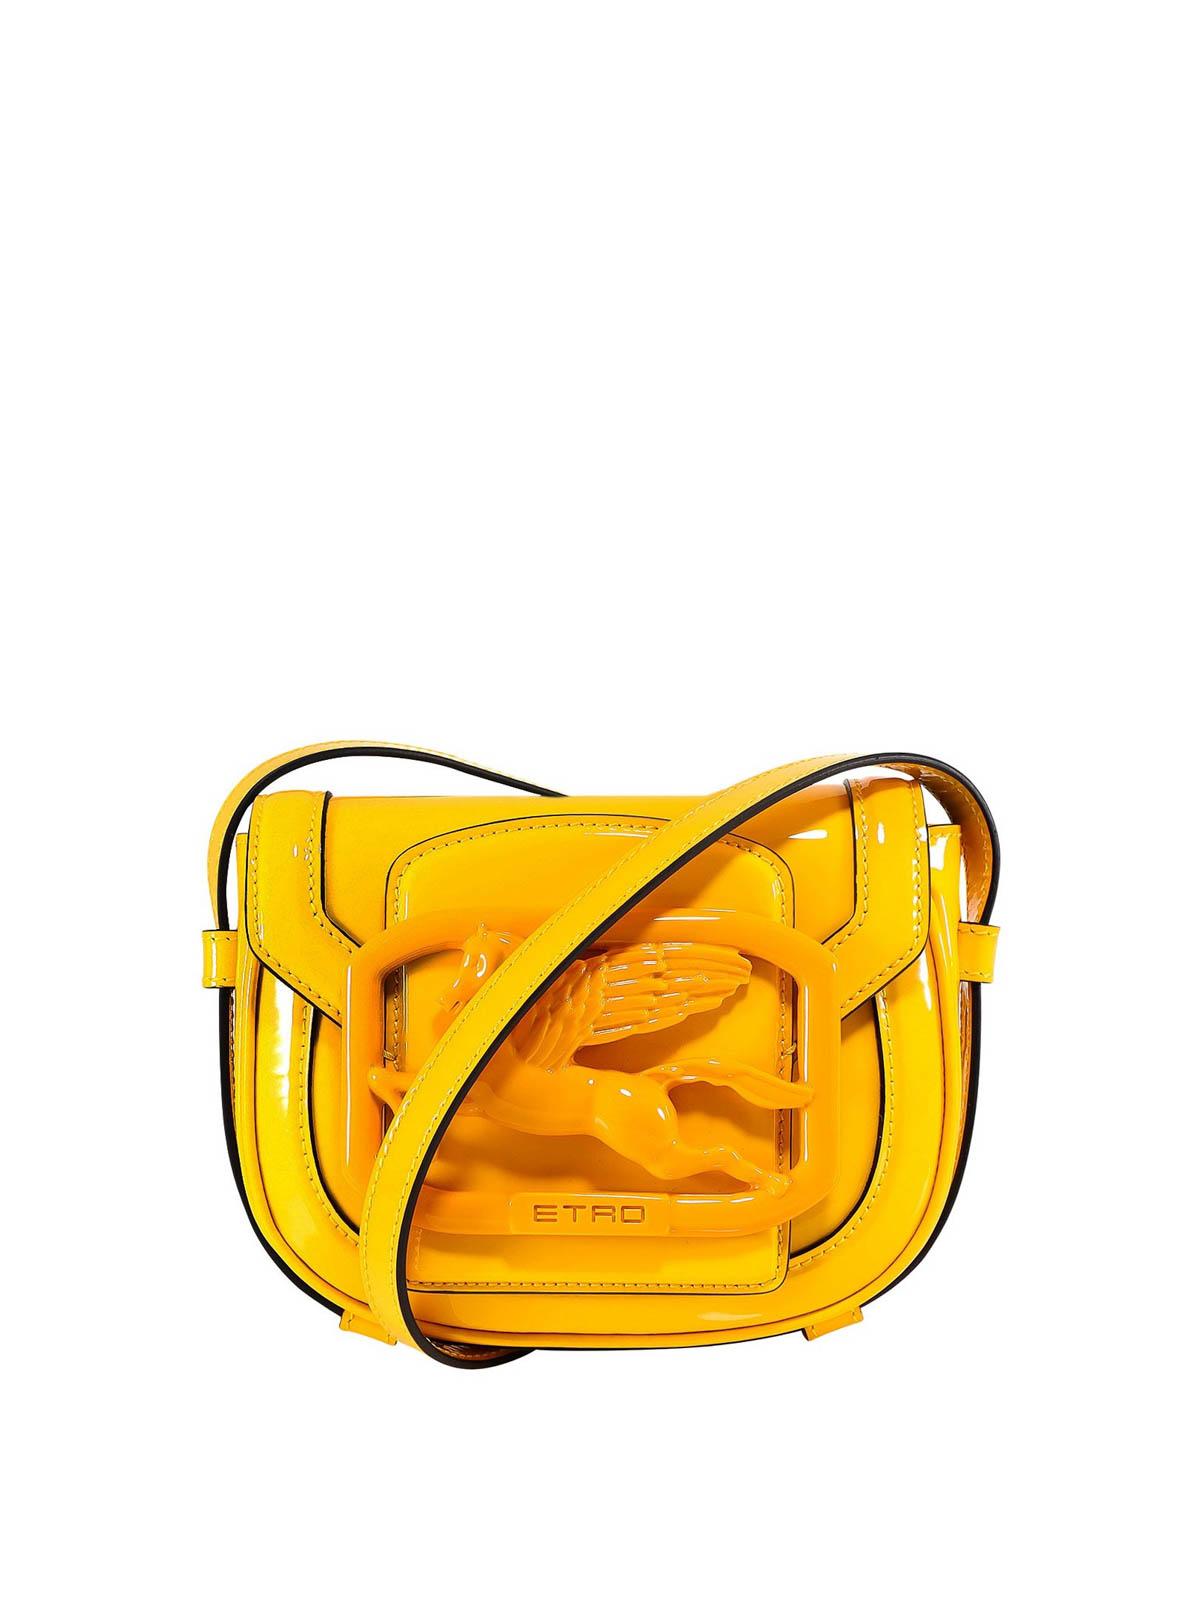 Etro PEGASO SMALL CROSS BODY BAG